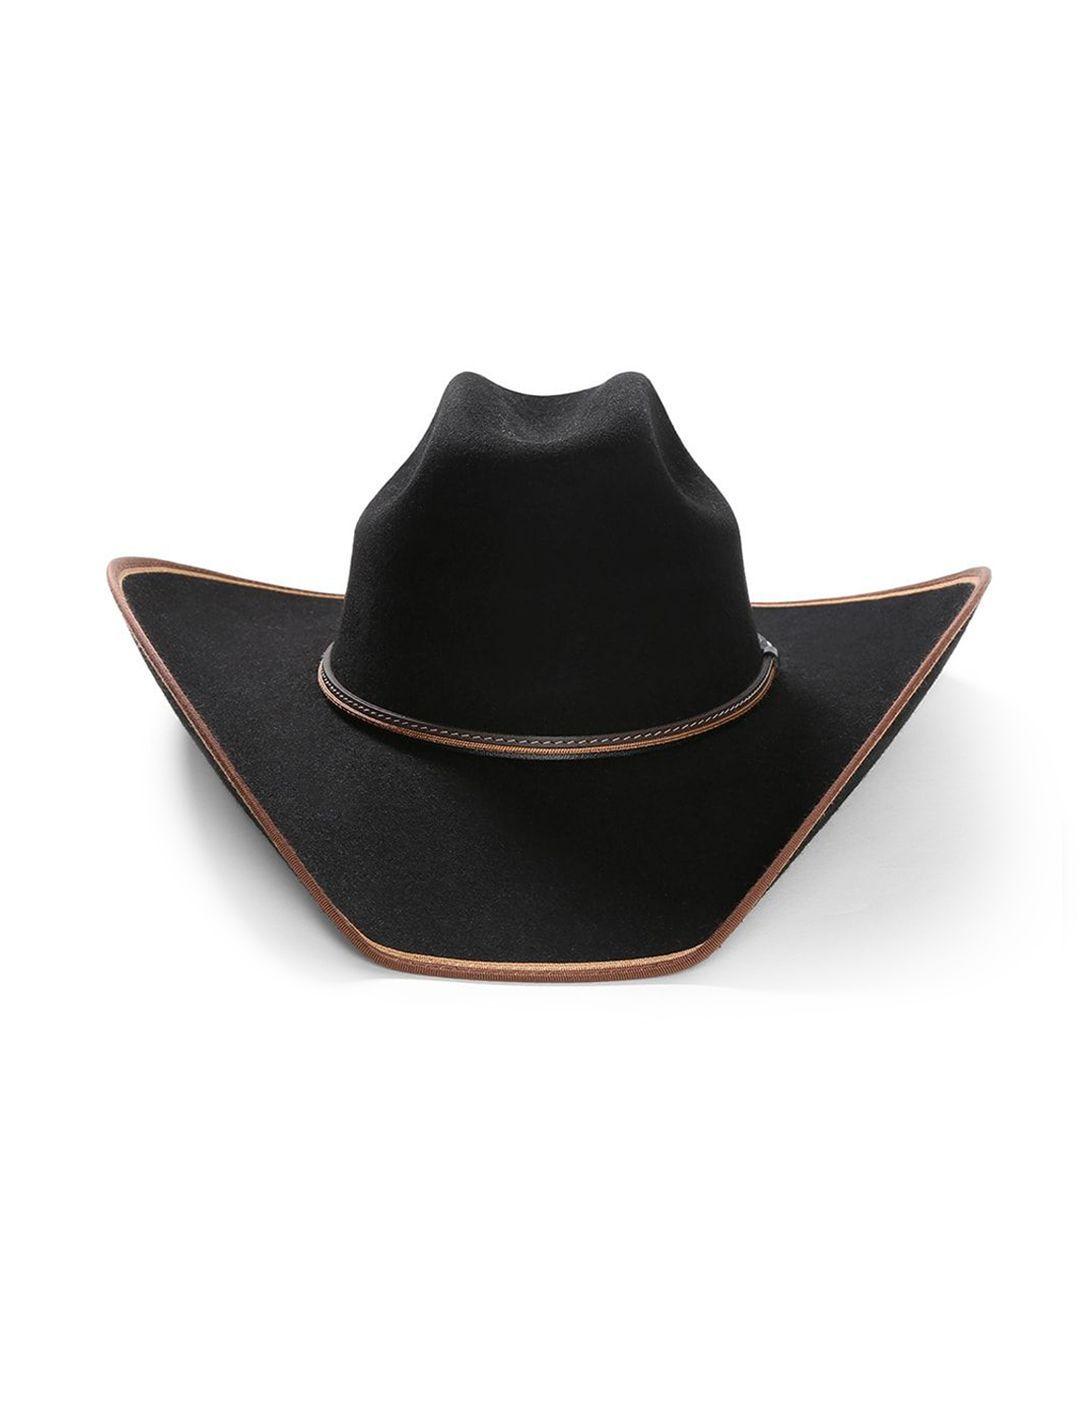 19fab0d1a3fa8 Stetson Men s Foothills 3X Wool Felt Cowboy Hat SWFTHSB7240